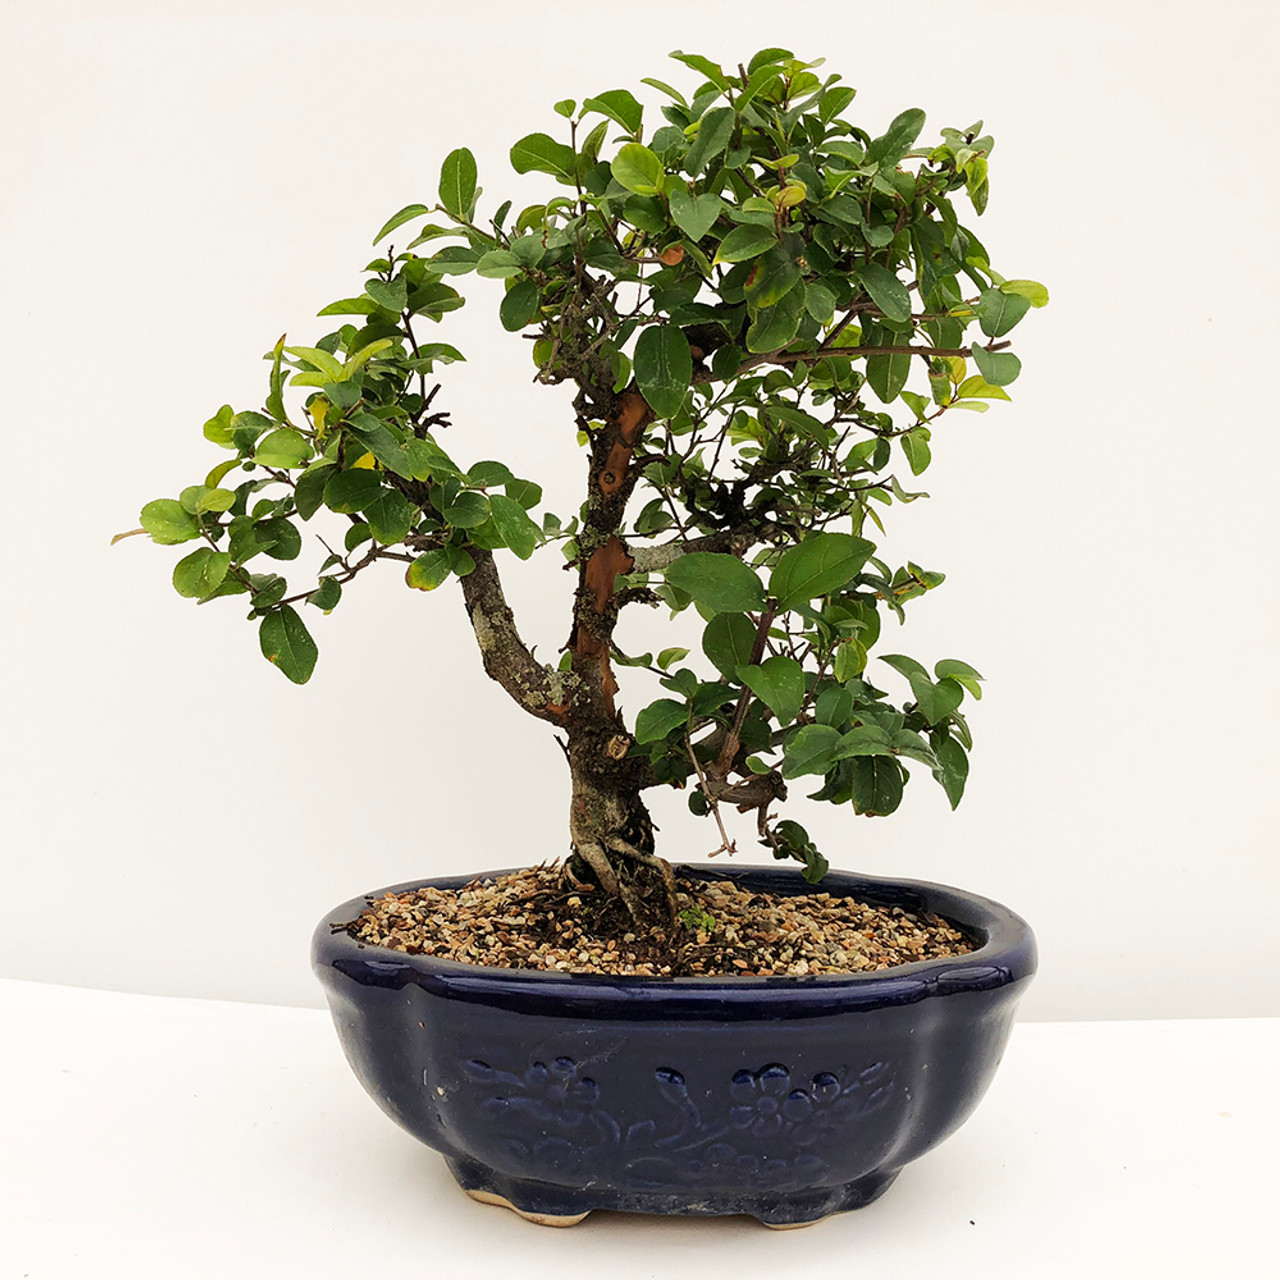 Chinese Sweet Plum Bonsai Tree Bonsai Outlet